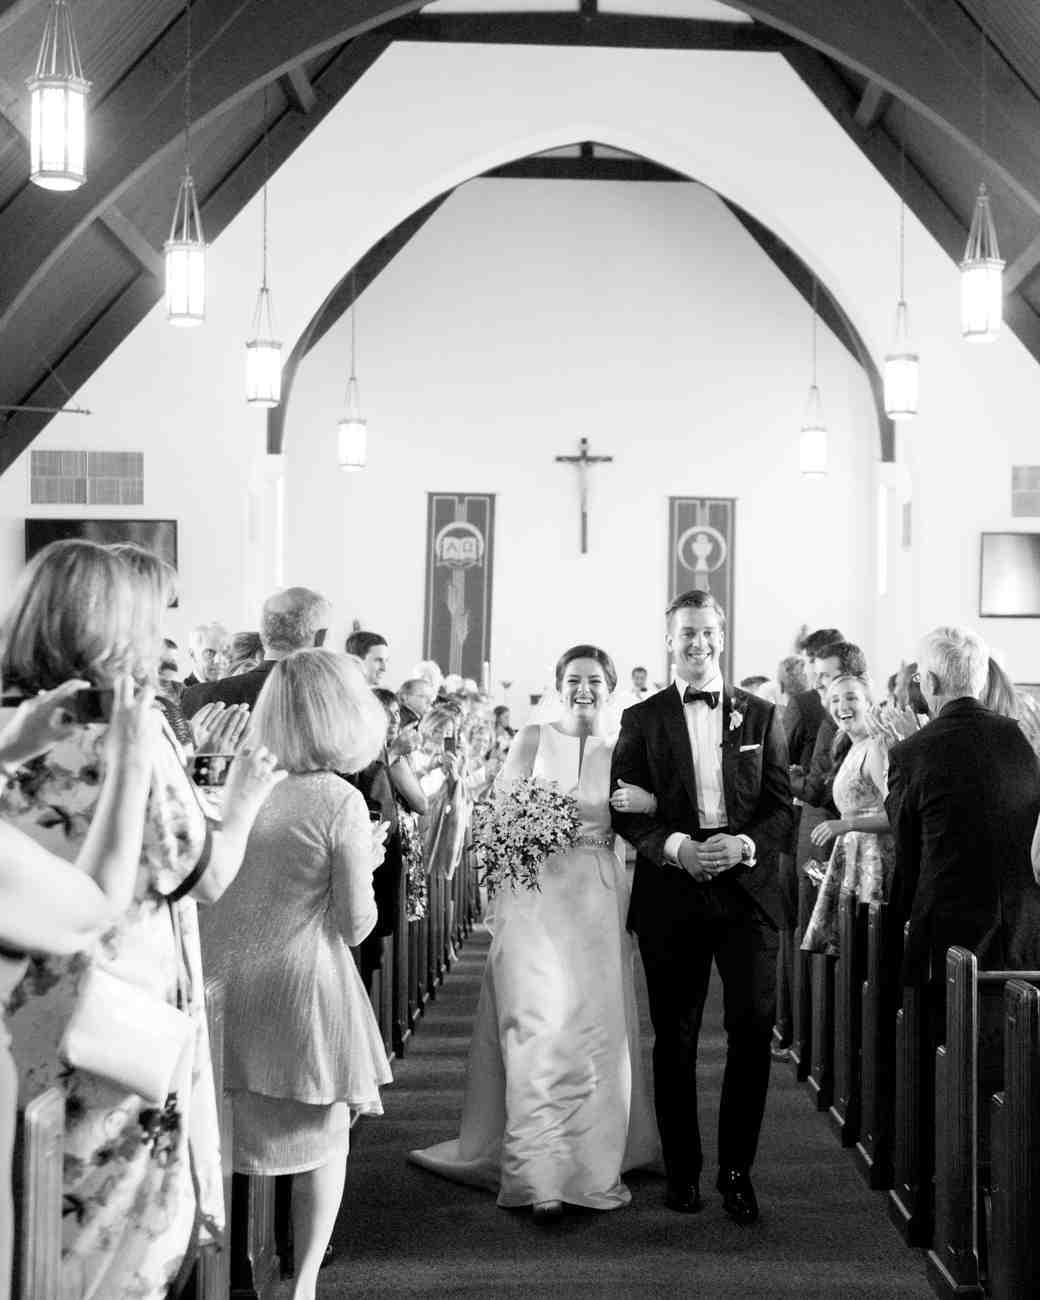 taylor-john-wedding-ceremony-224-s112507-0116.jpg